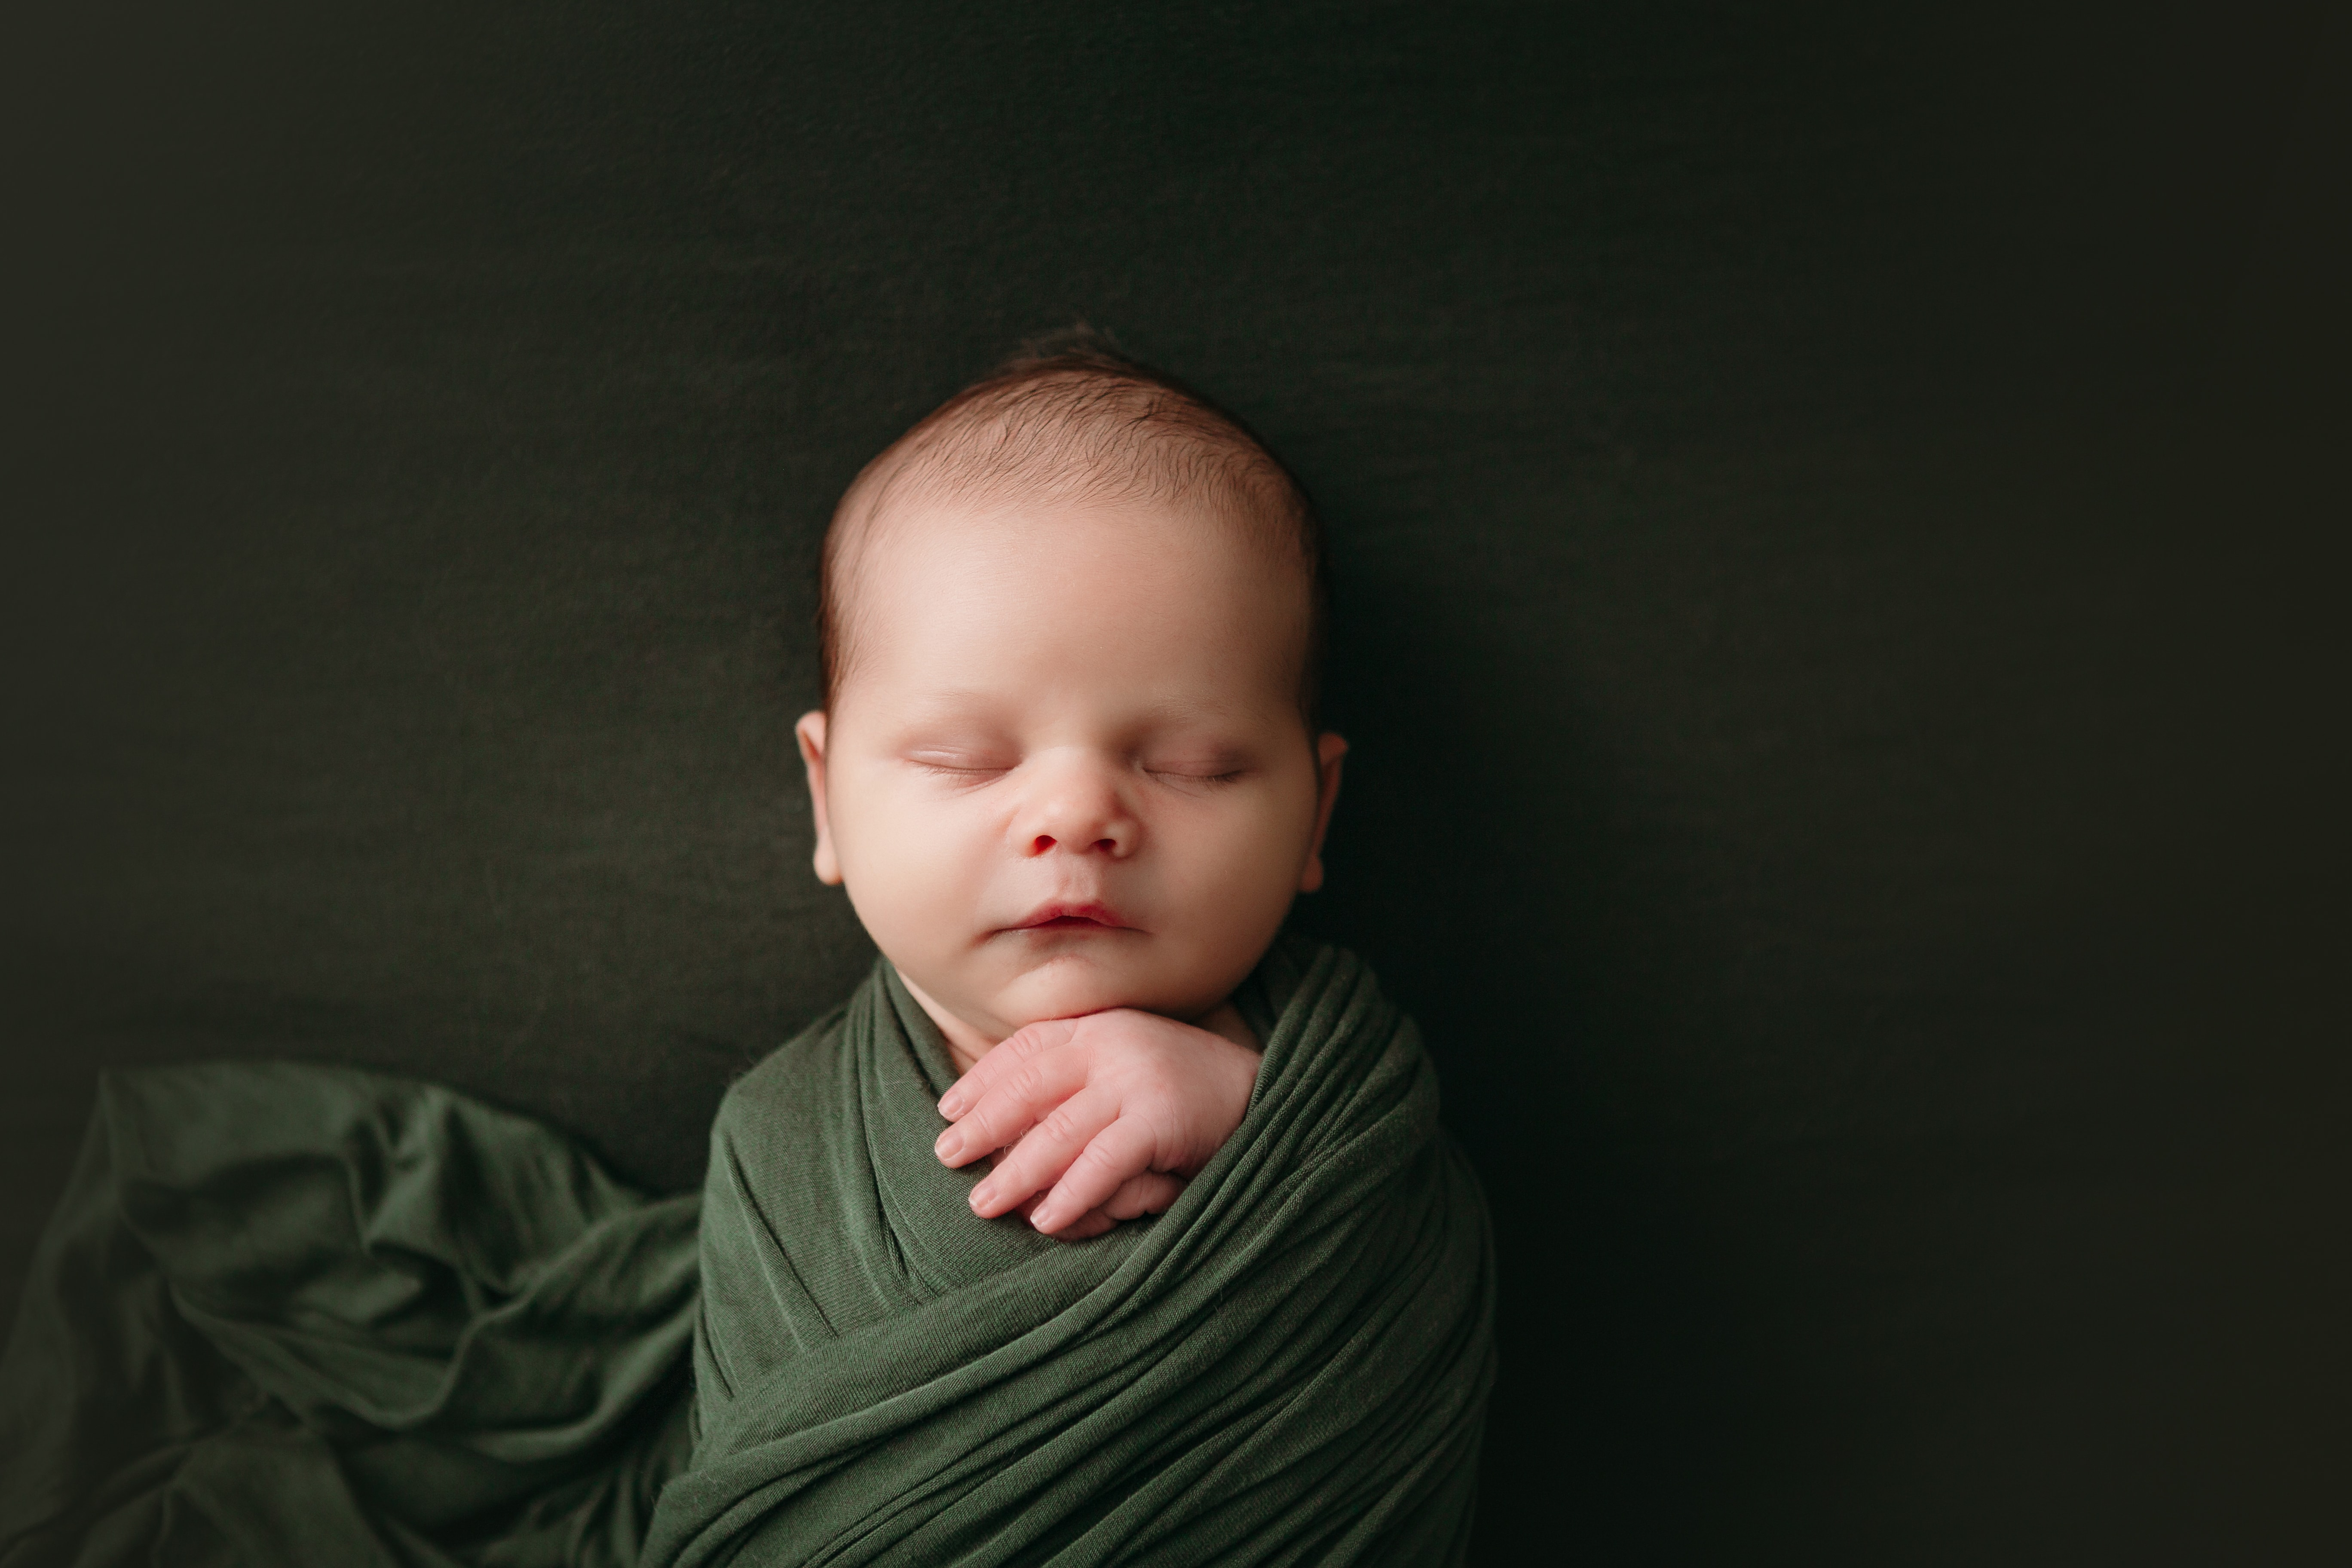 Kitsap County, Maternity, Newborn, Photography, Bremerton, Poulsbo, Port Orchard, Silverdale, Bainbridge Island, fine art